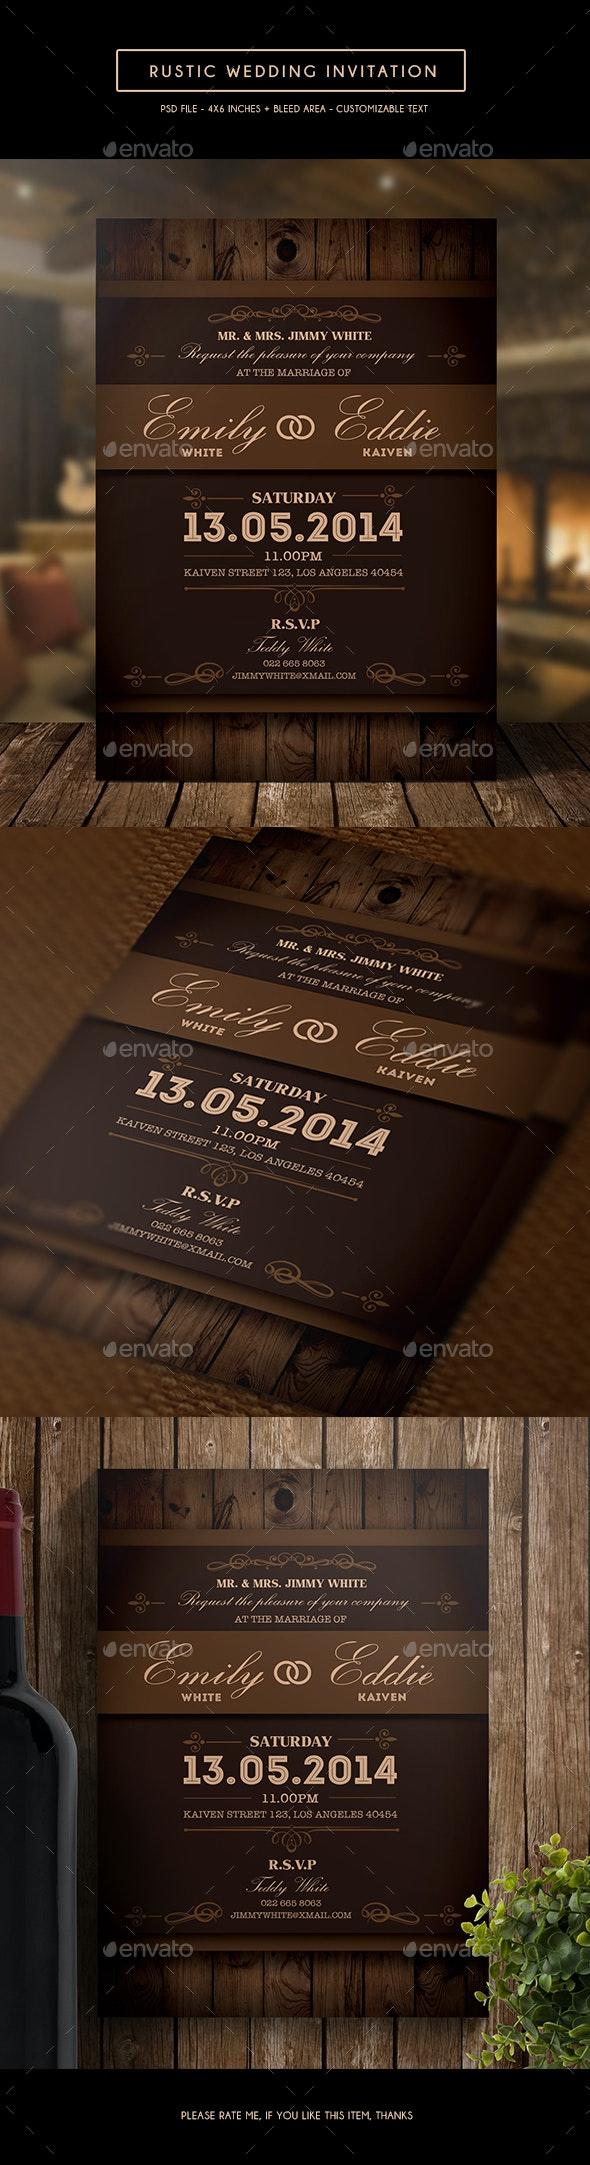 Rustic Wedding Invitation - Weddings Cards & Invites